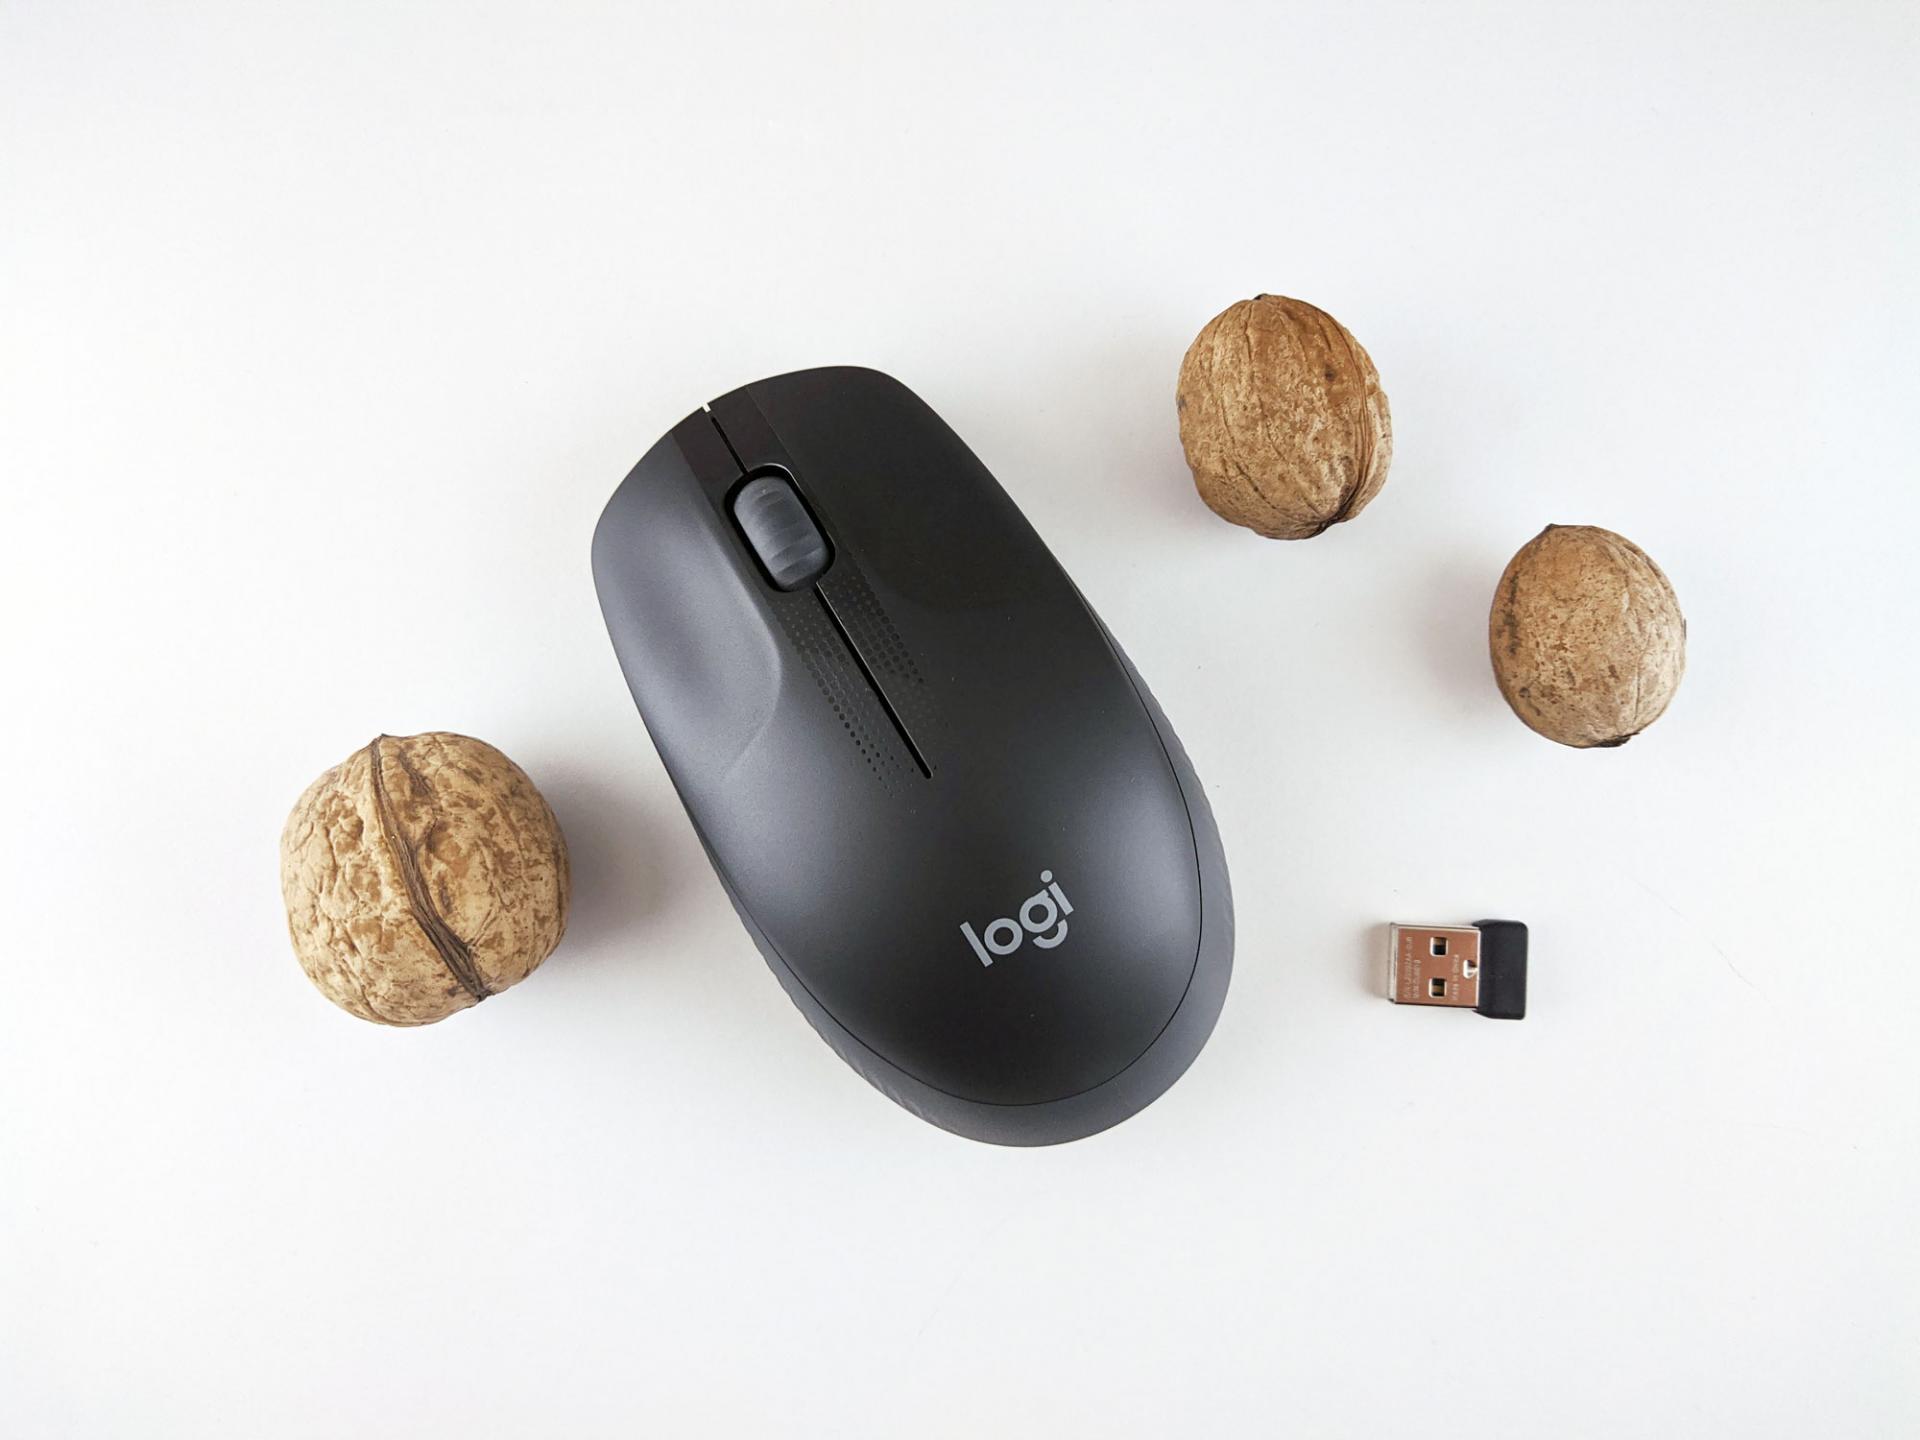 Тест-драйв мыши Logitech M190